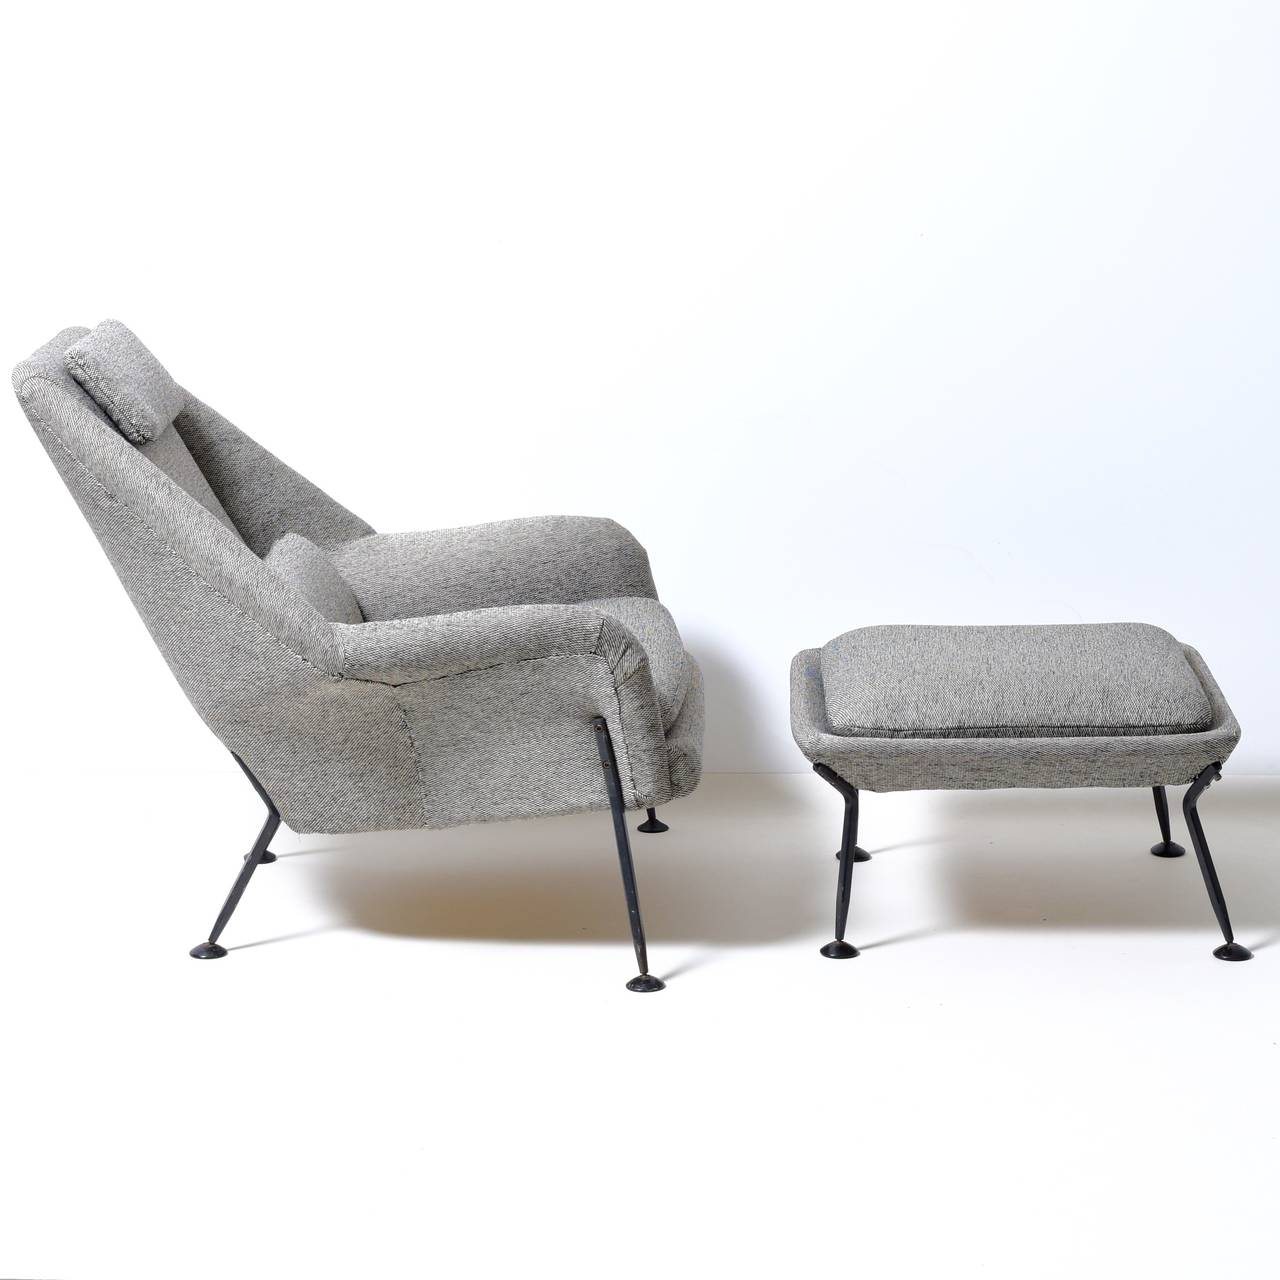 Woven Ernest Race Heron chair & footstool